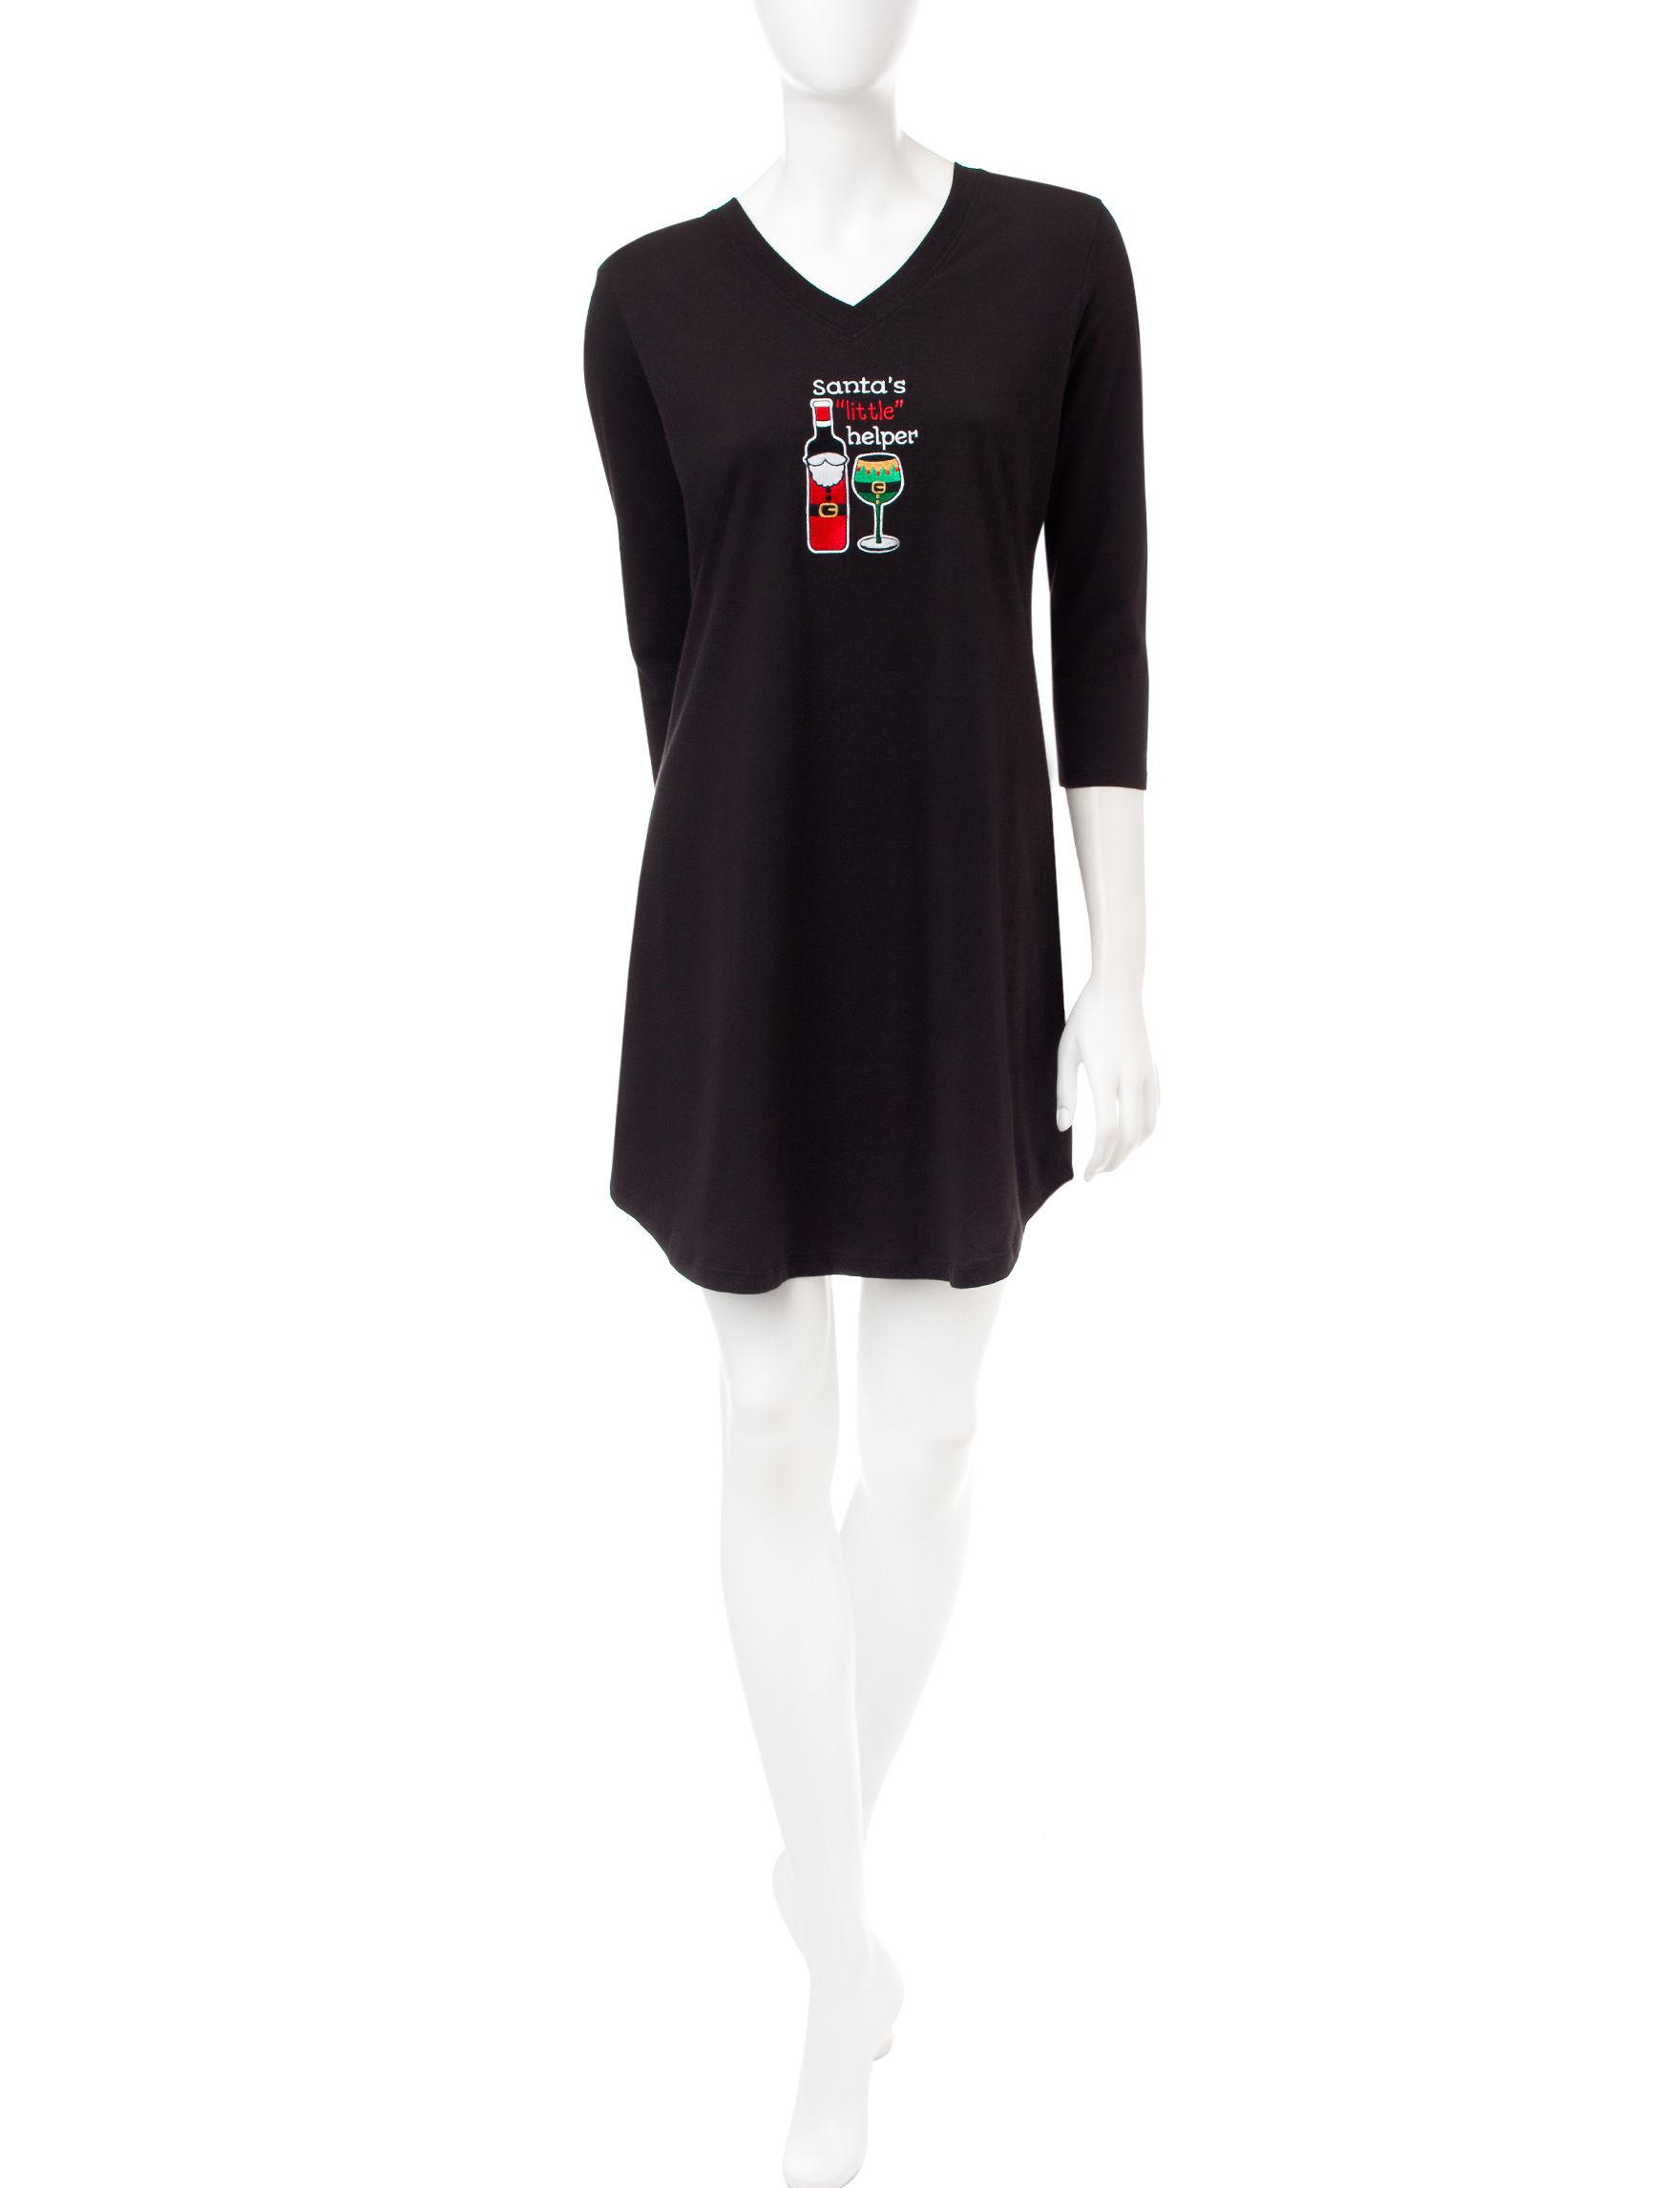 Pillow Talk Black Nightgowns & Sleep Shirts